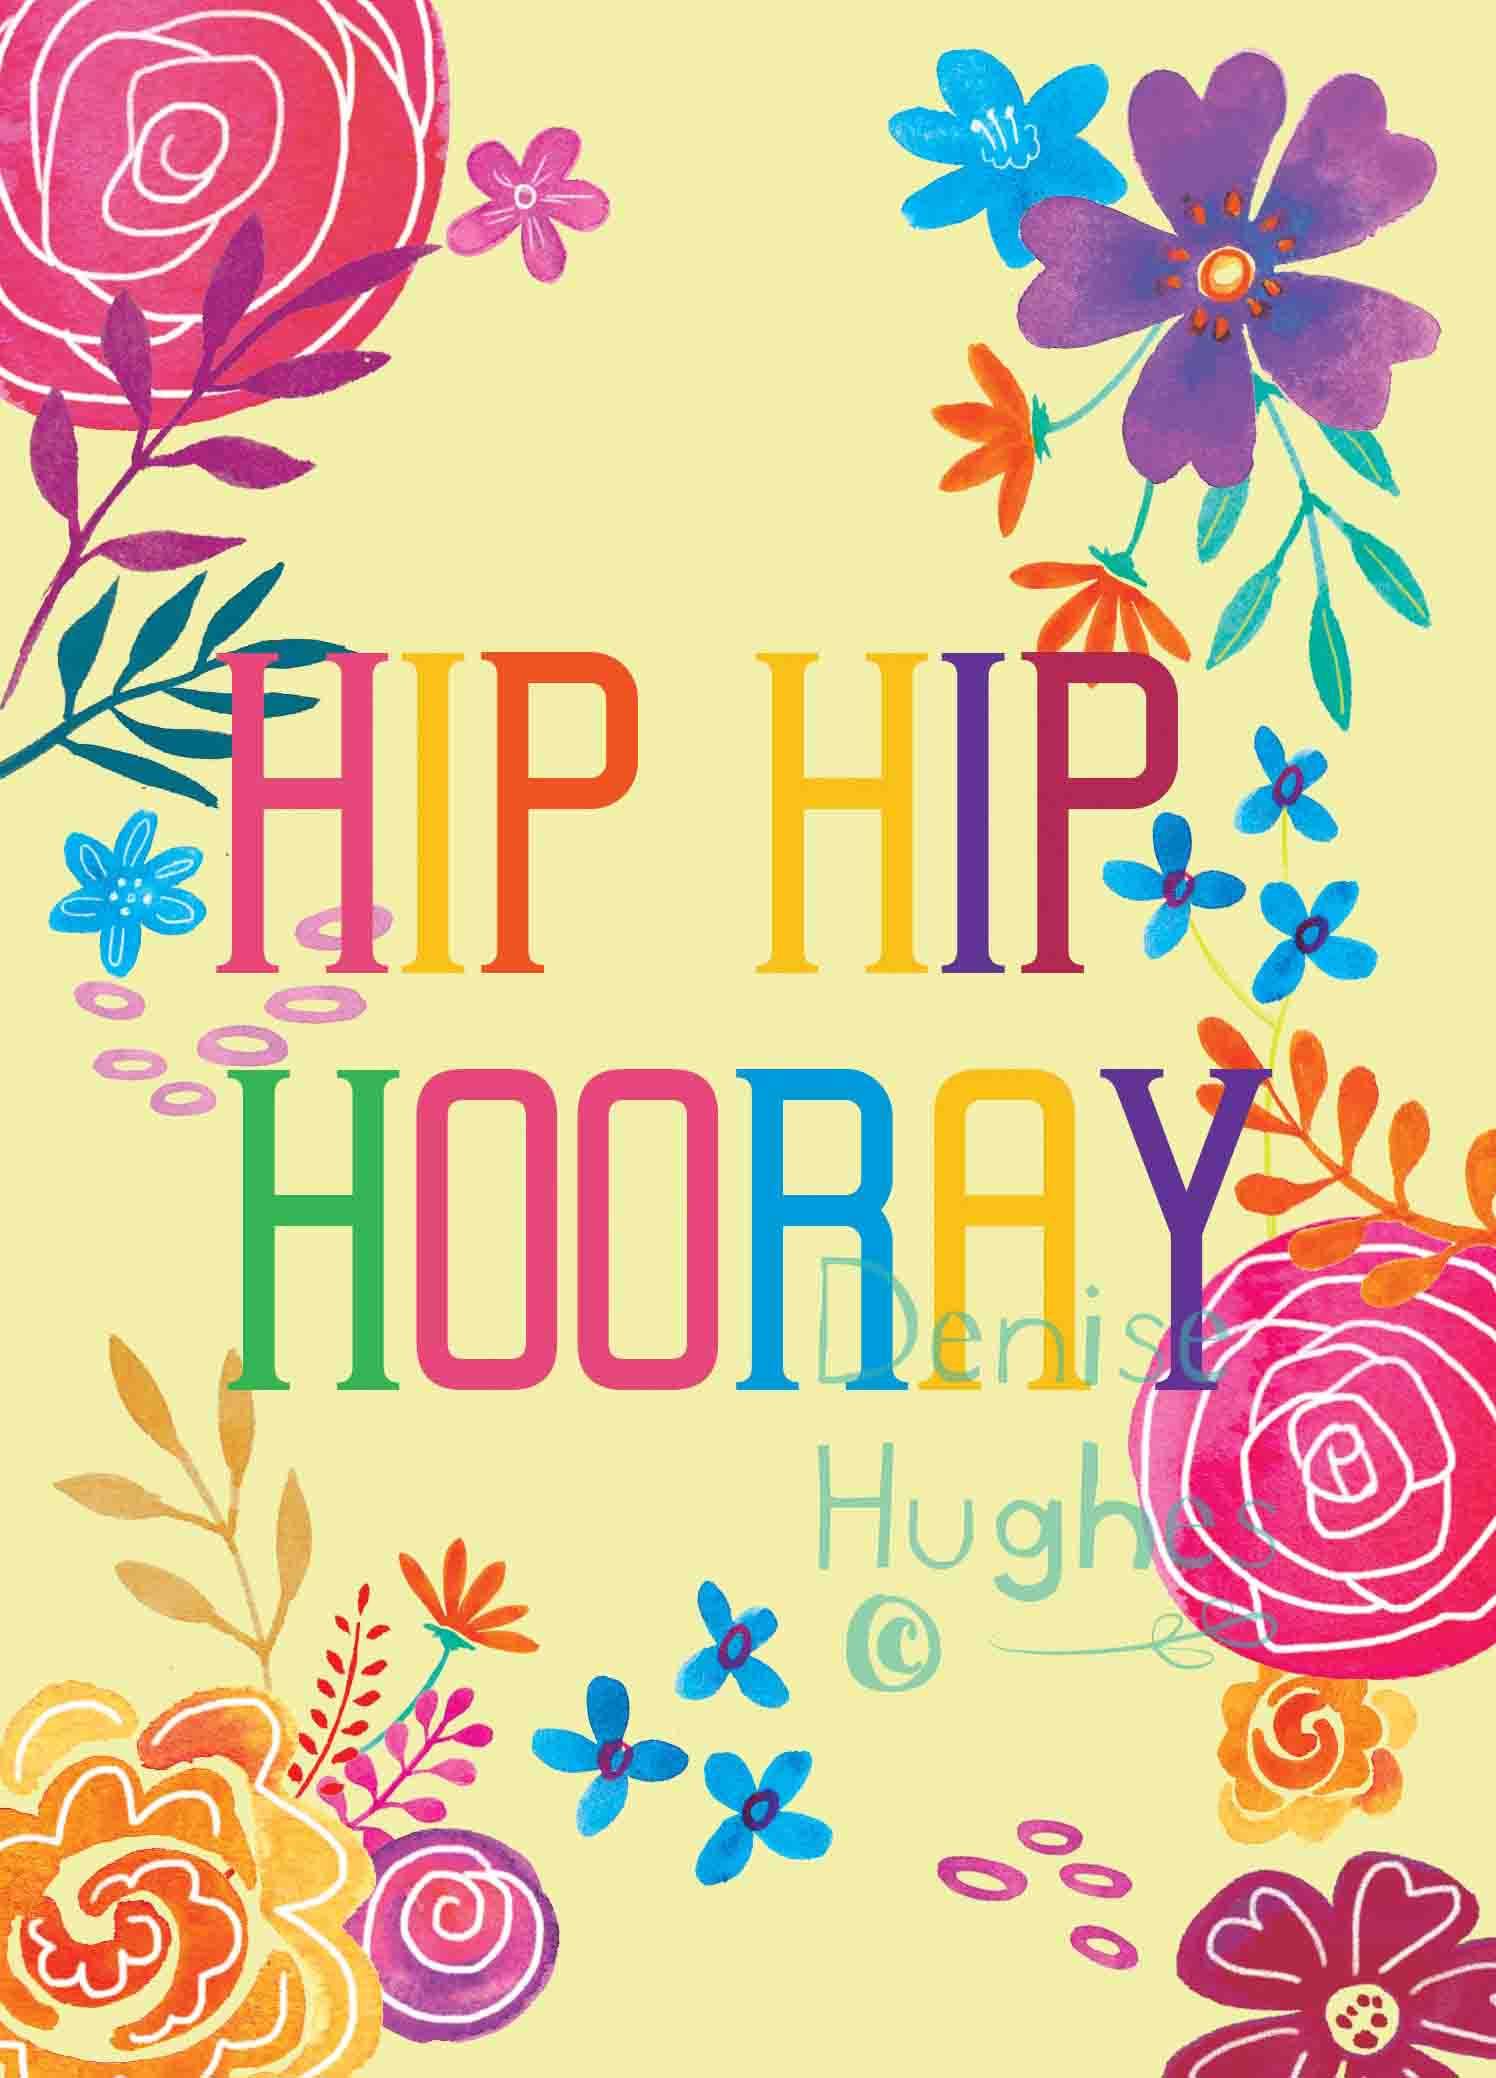 Hip Hip Hooray card cropped RGB.jpg